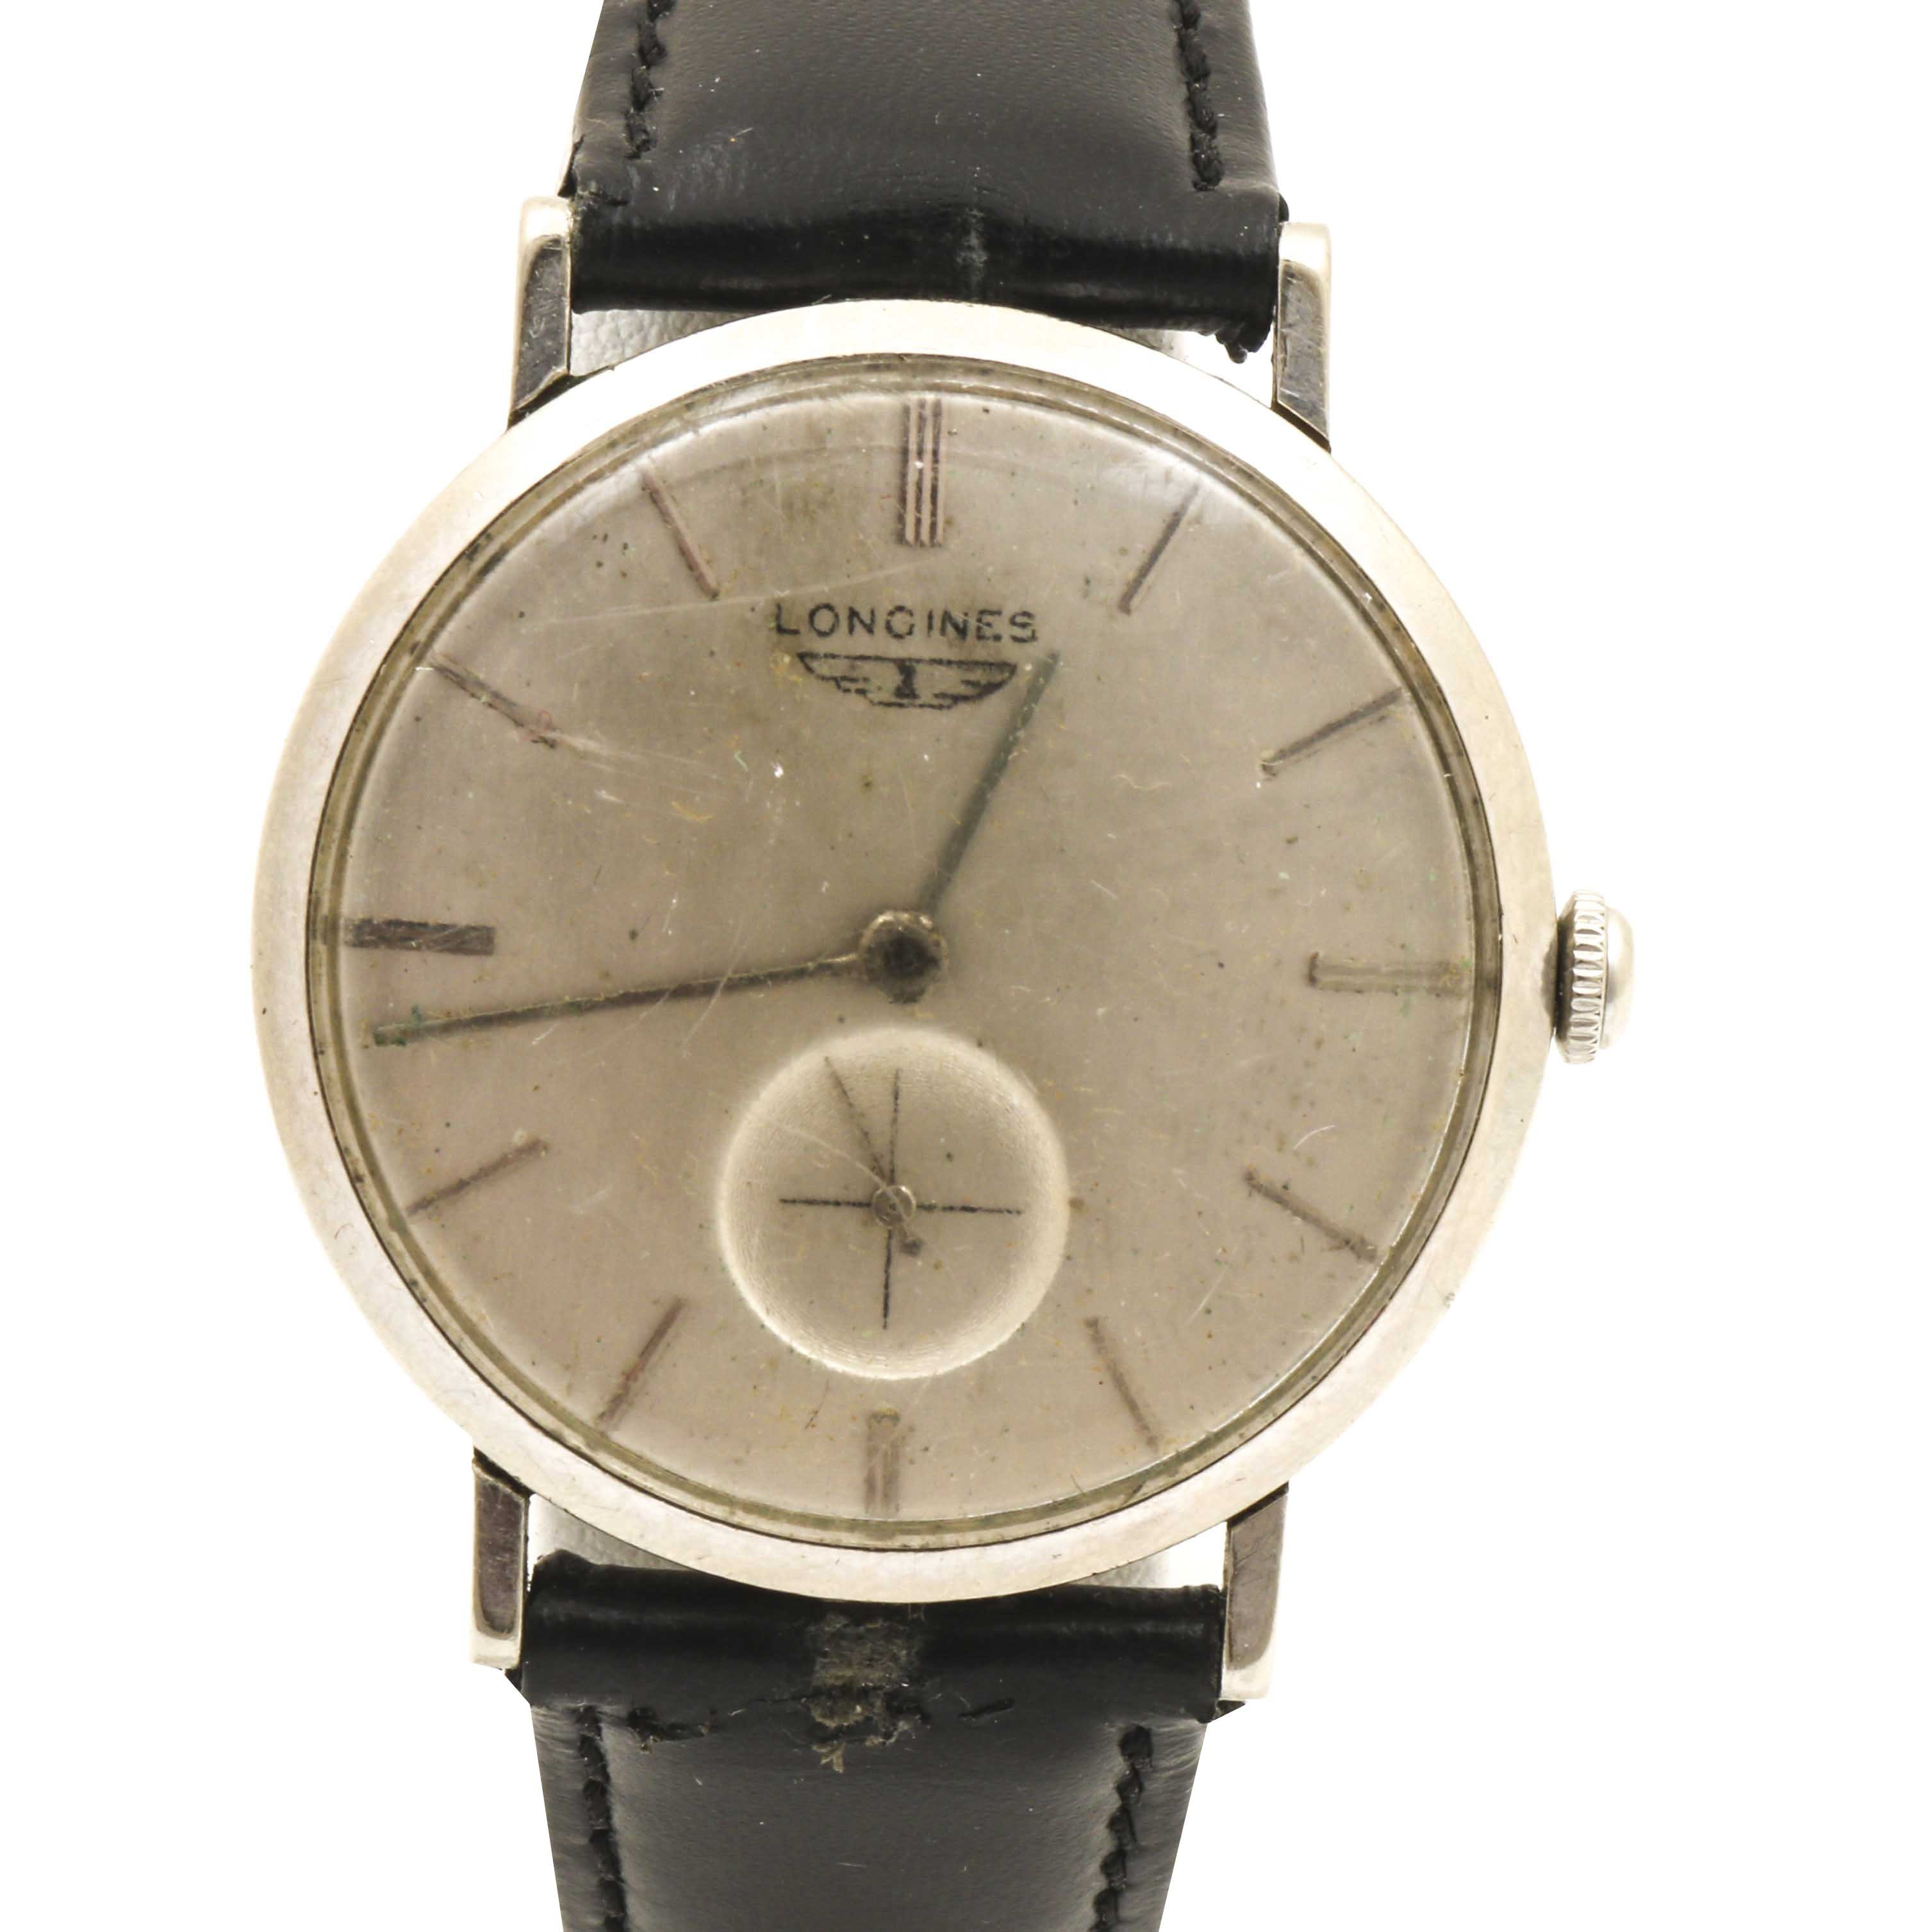 Longines 10K White Gold Filled Wristwatch